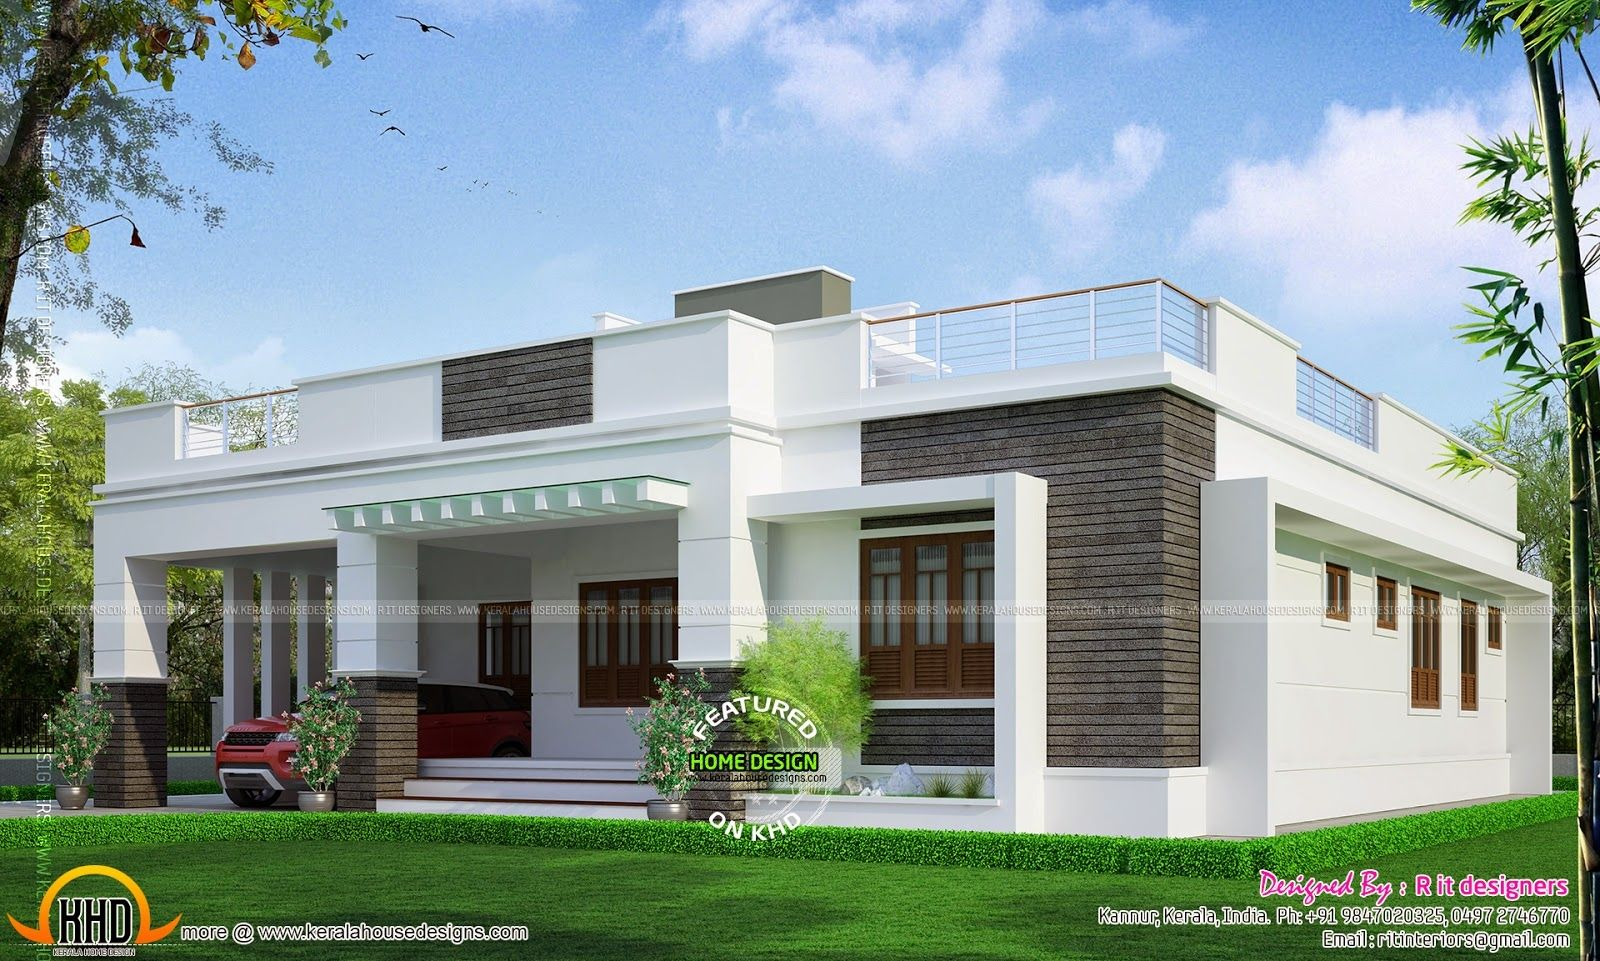 House Designs Floor Plans Kerala Single Floor House Design House Roof Design Simple House Design